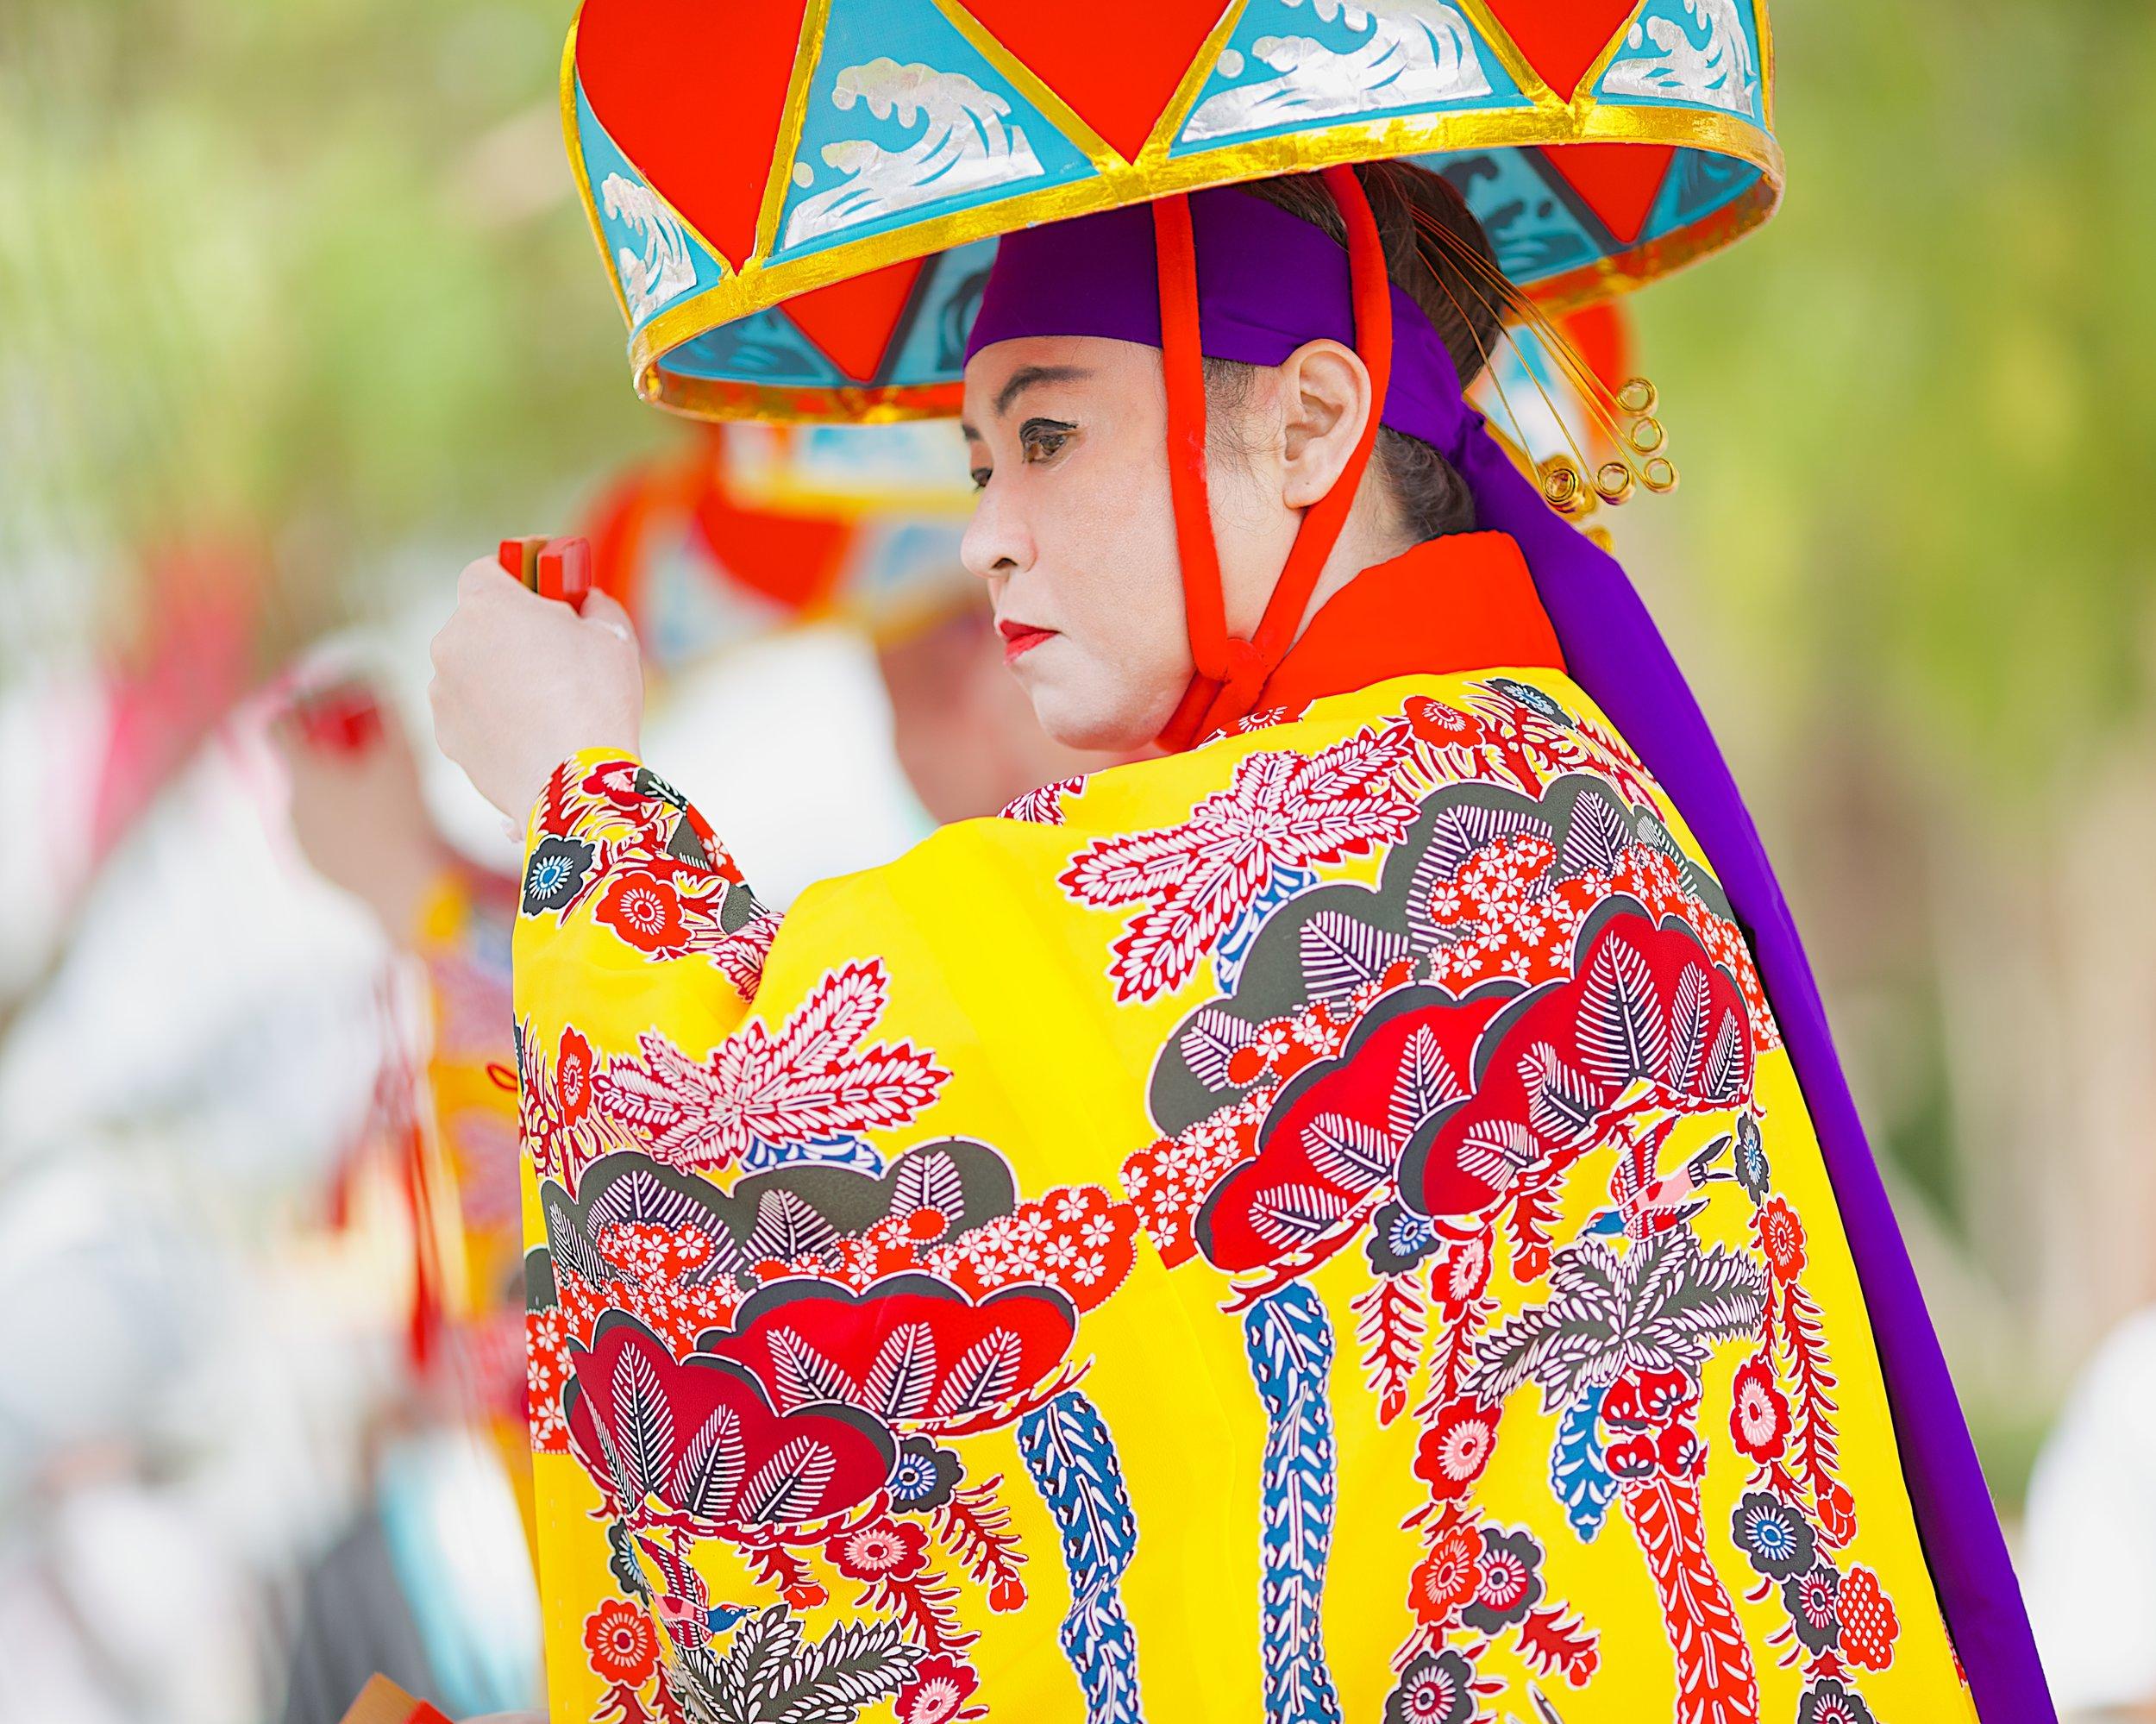 ohtori-no-kai---japanese-cultural-fair-of-santa-cruz-2015_18974088264_o.jpg